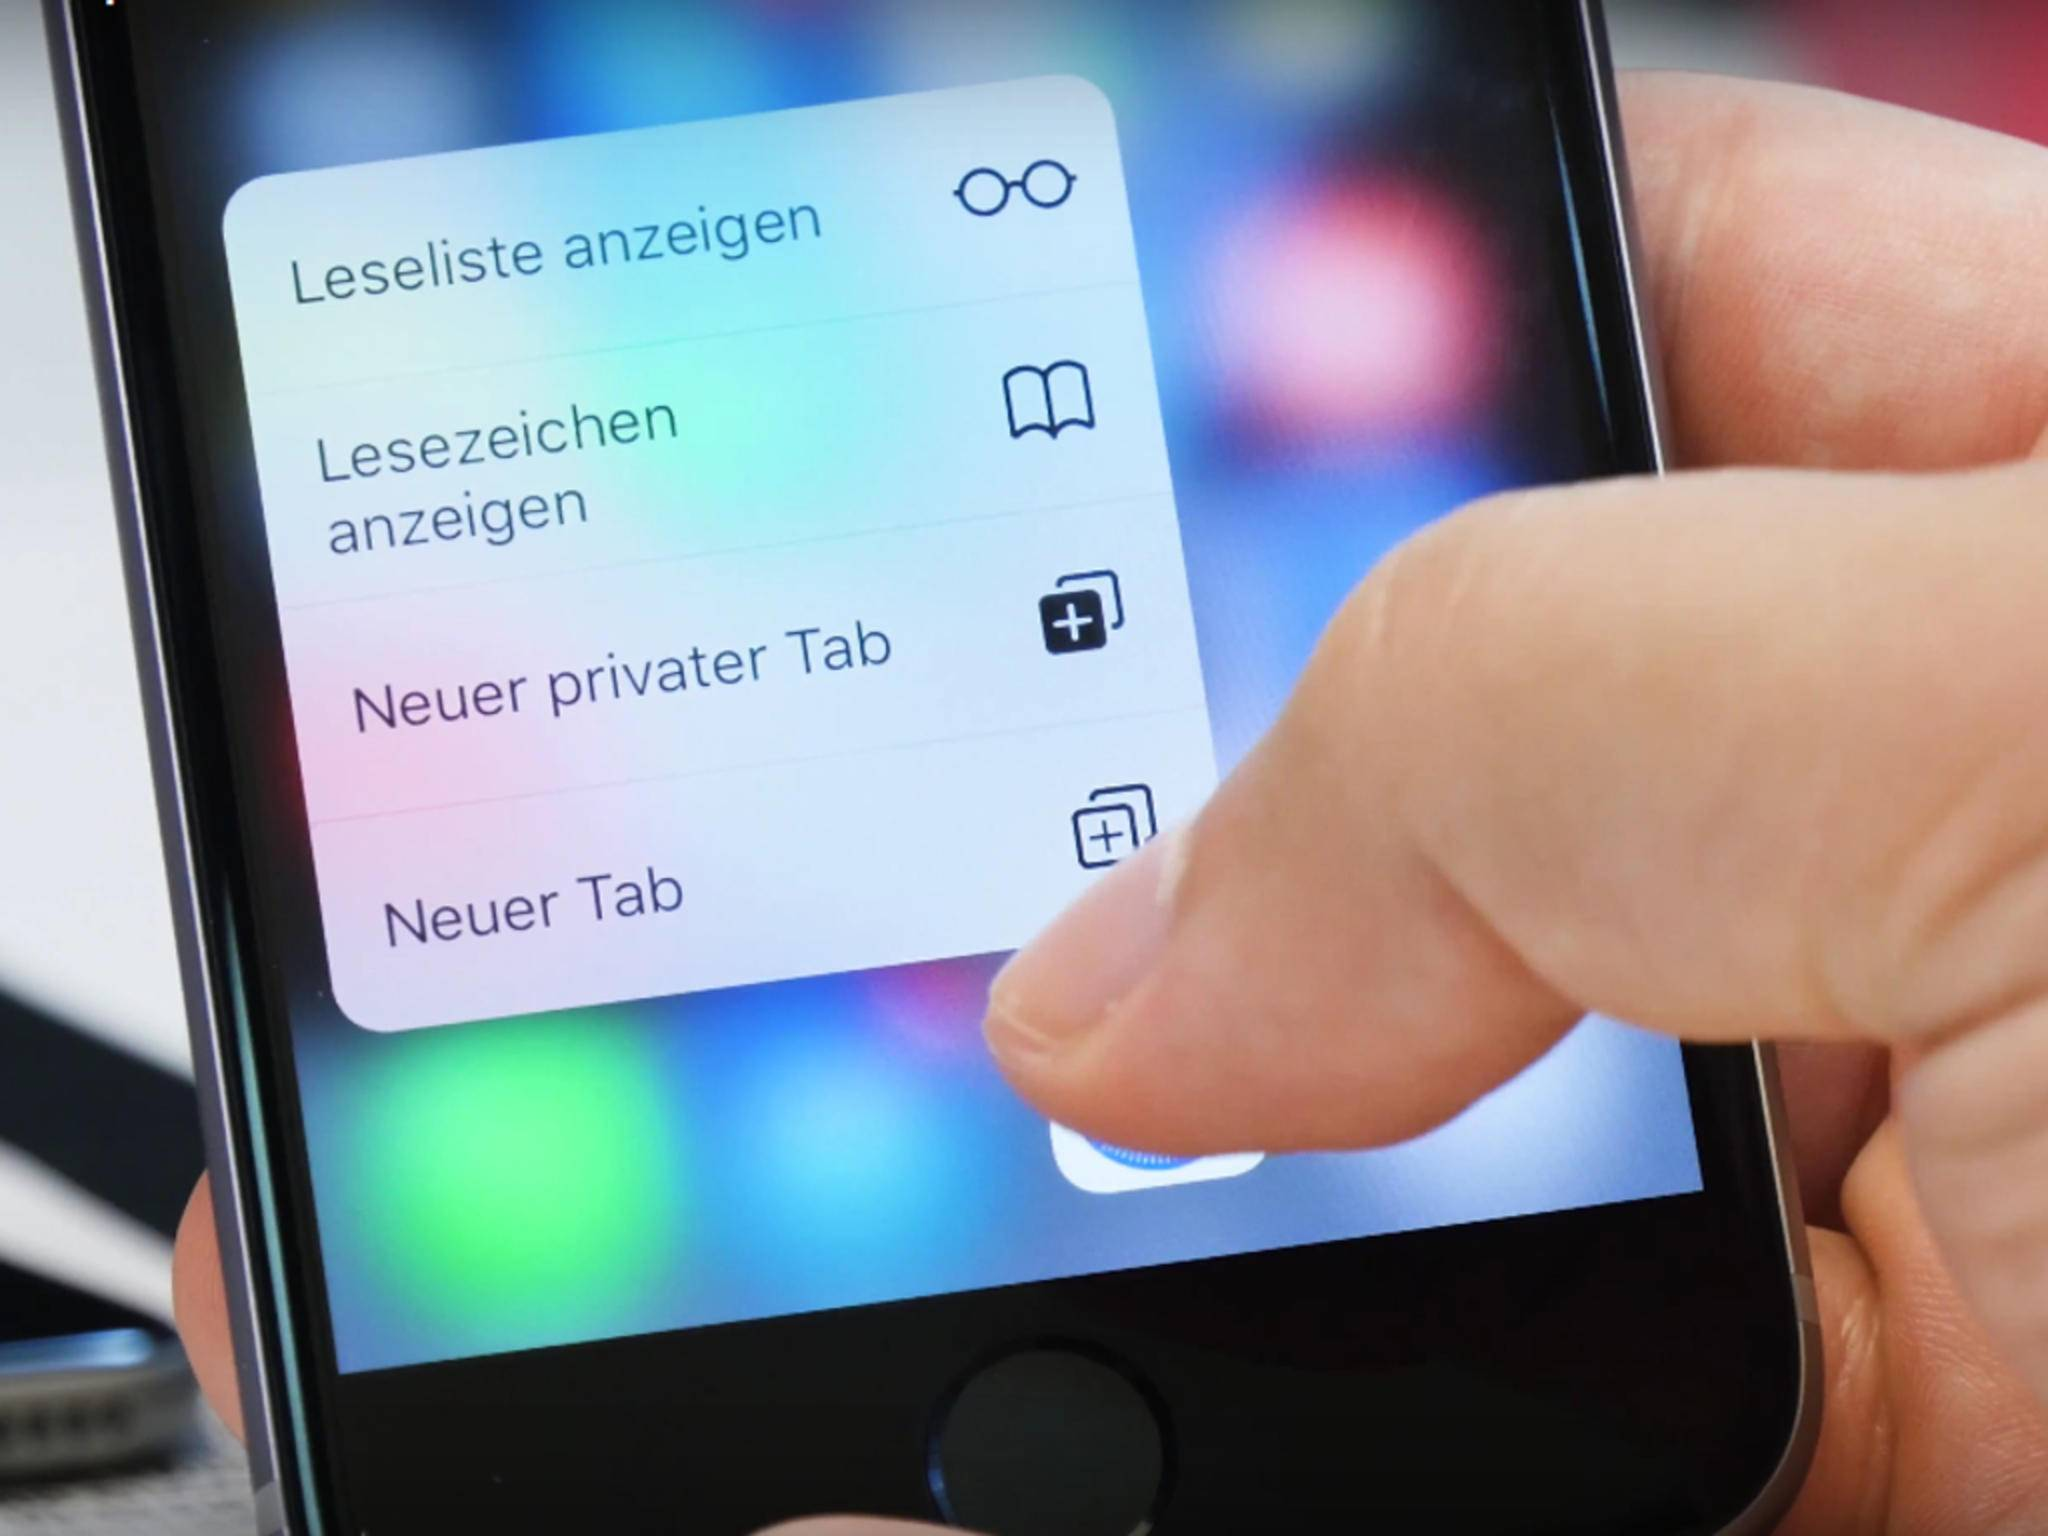 Die erste iOS 9.3.2 Beta soll Verzögerungen bei den Quick Actions beheben.